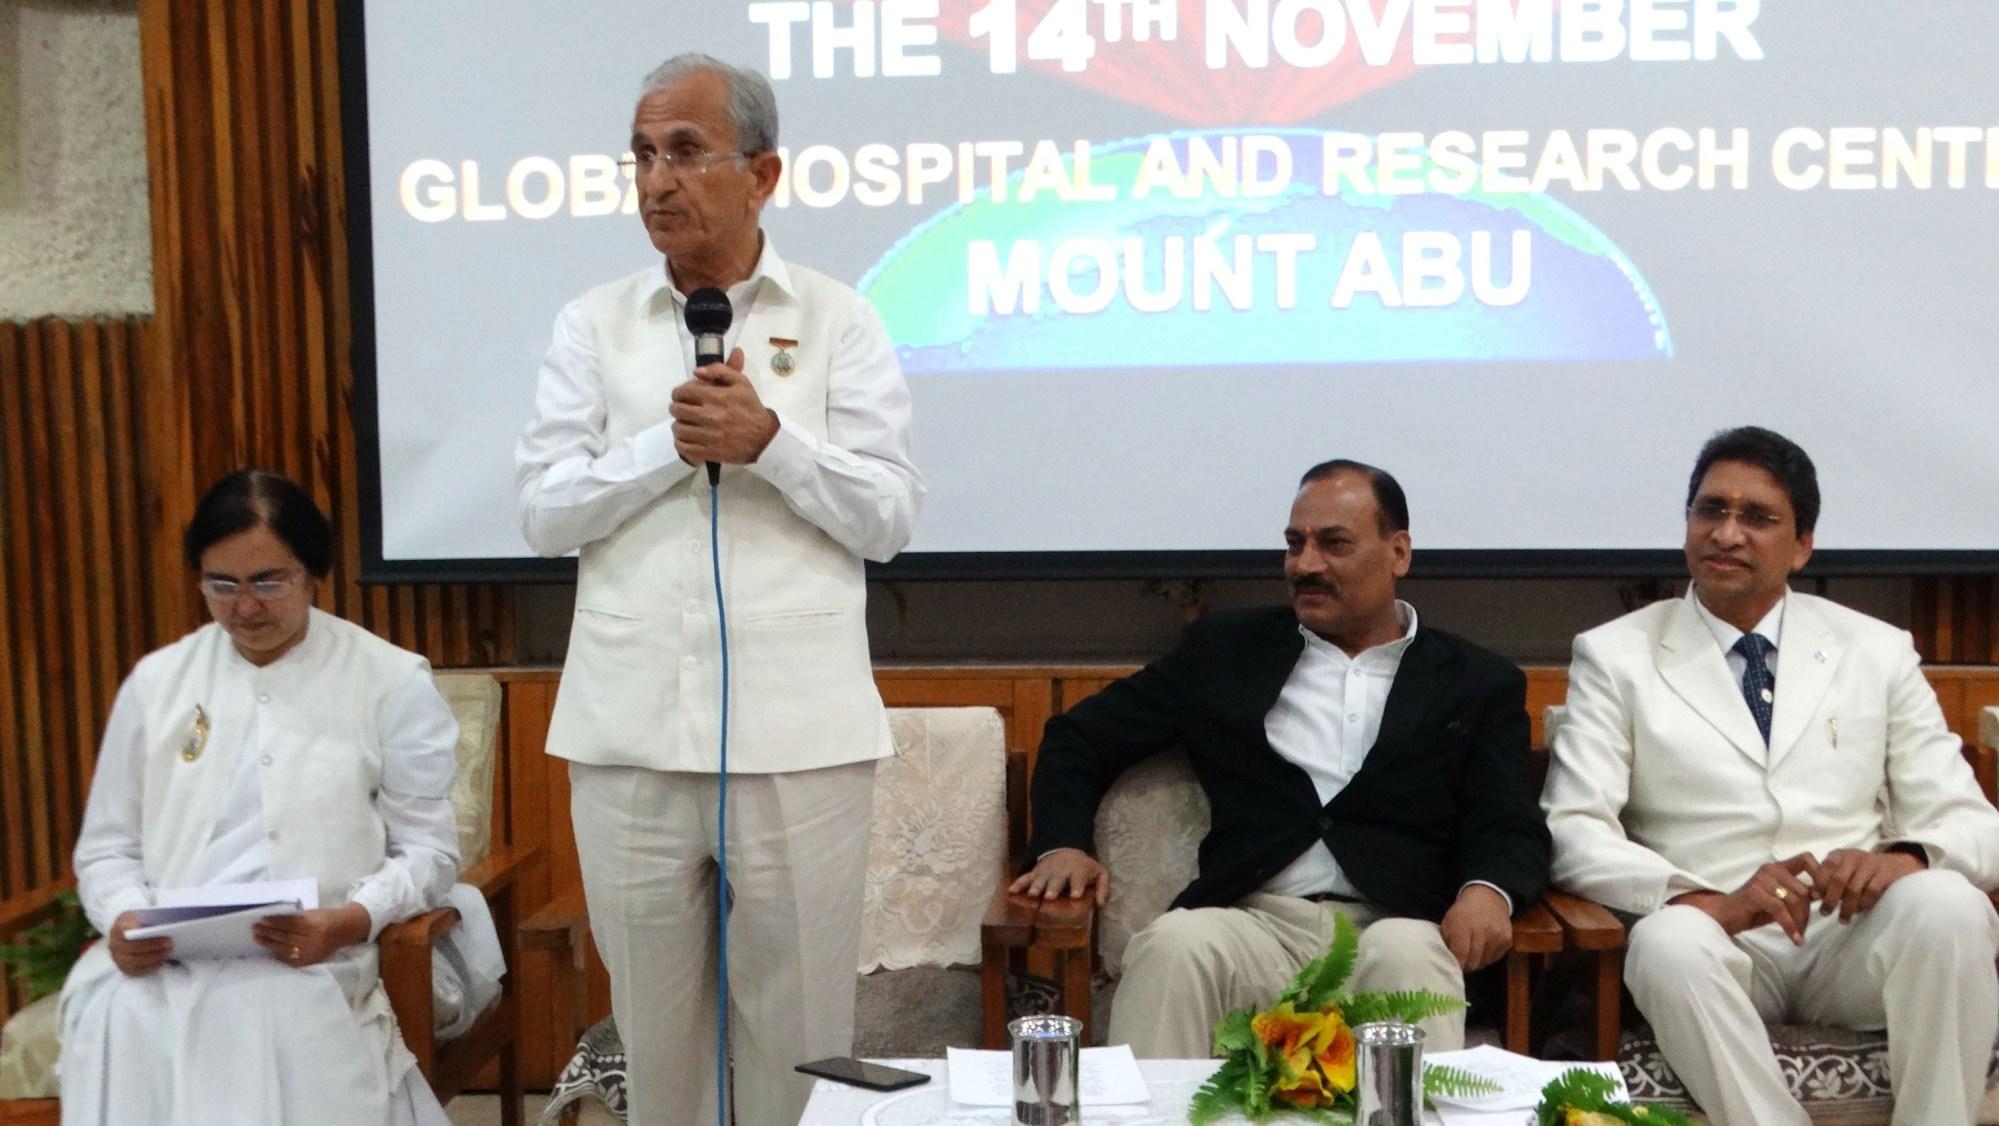 Mount Abu(Rajasthan) : Programme on World Diabetes Day at Global Hospital